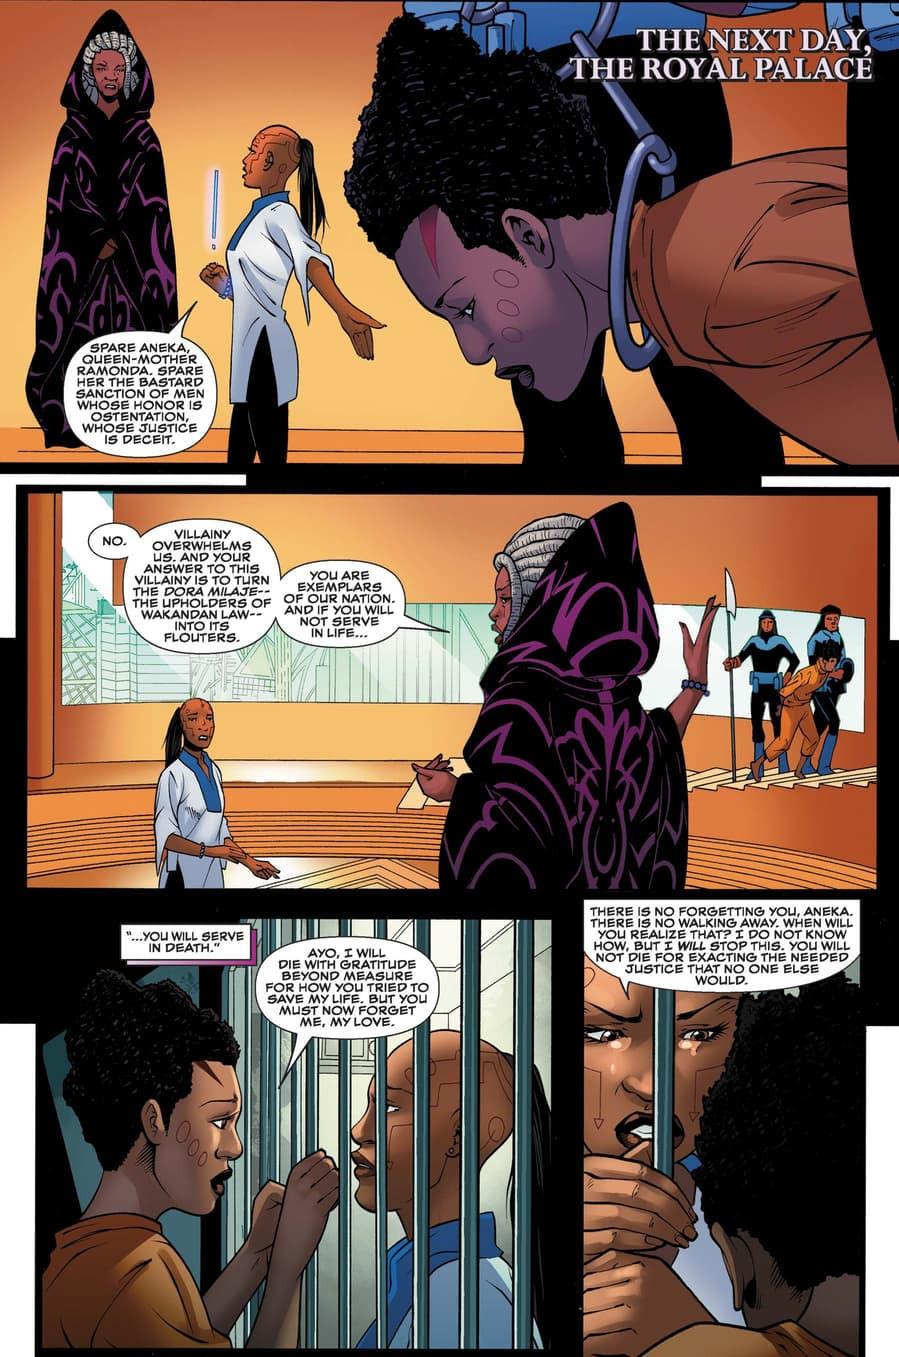 Ayo defends Aneka as recalled in BLACK PANTHER: WORLD OF WAKANDA (2016) #5.